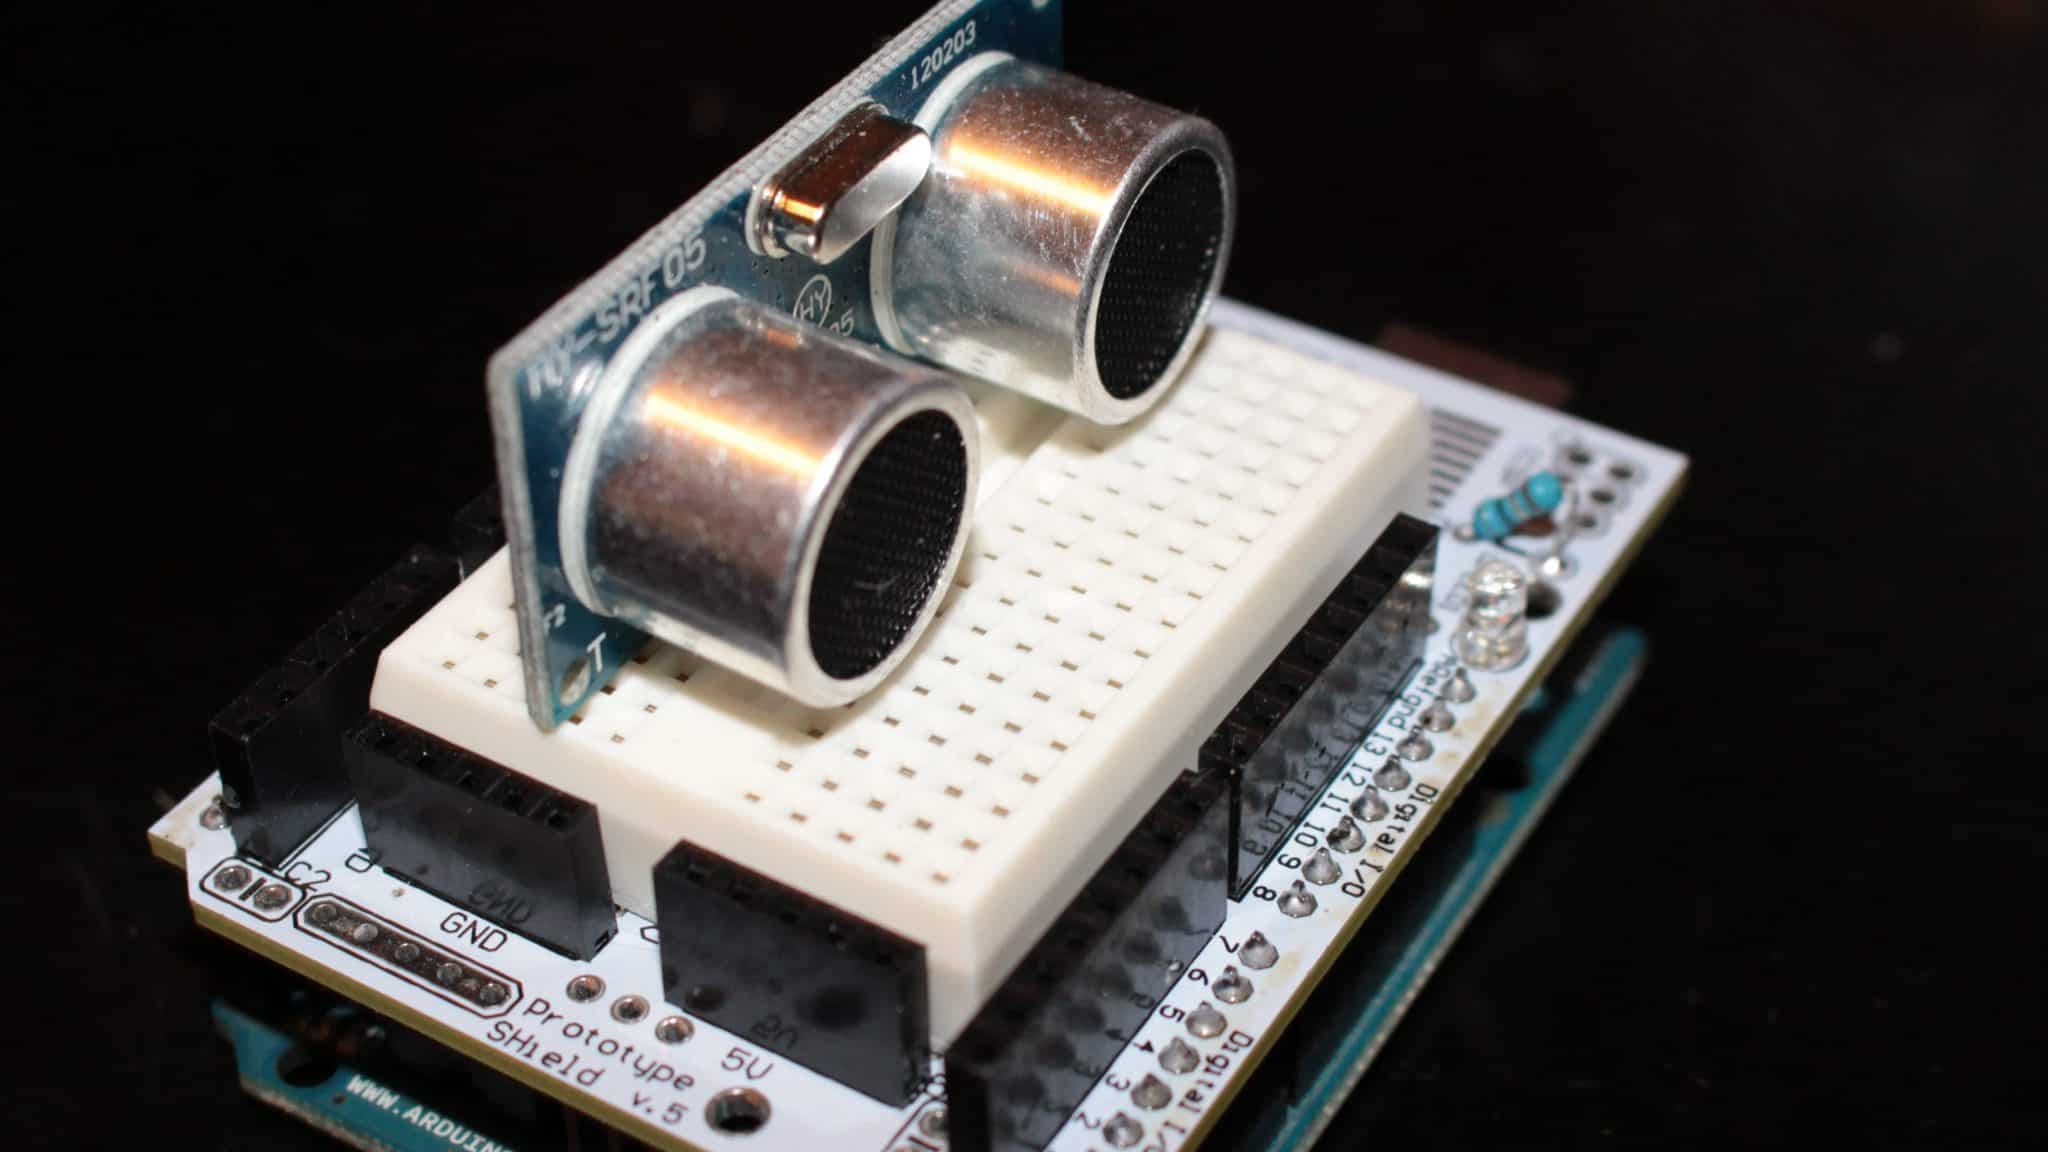 Sensor de ultrasonidos